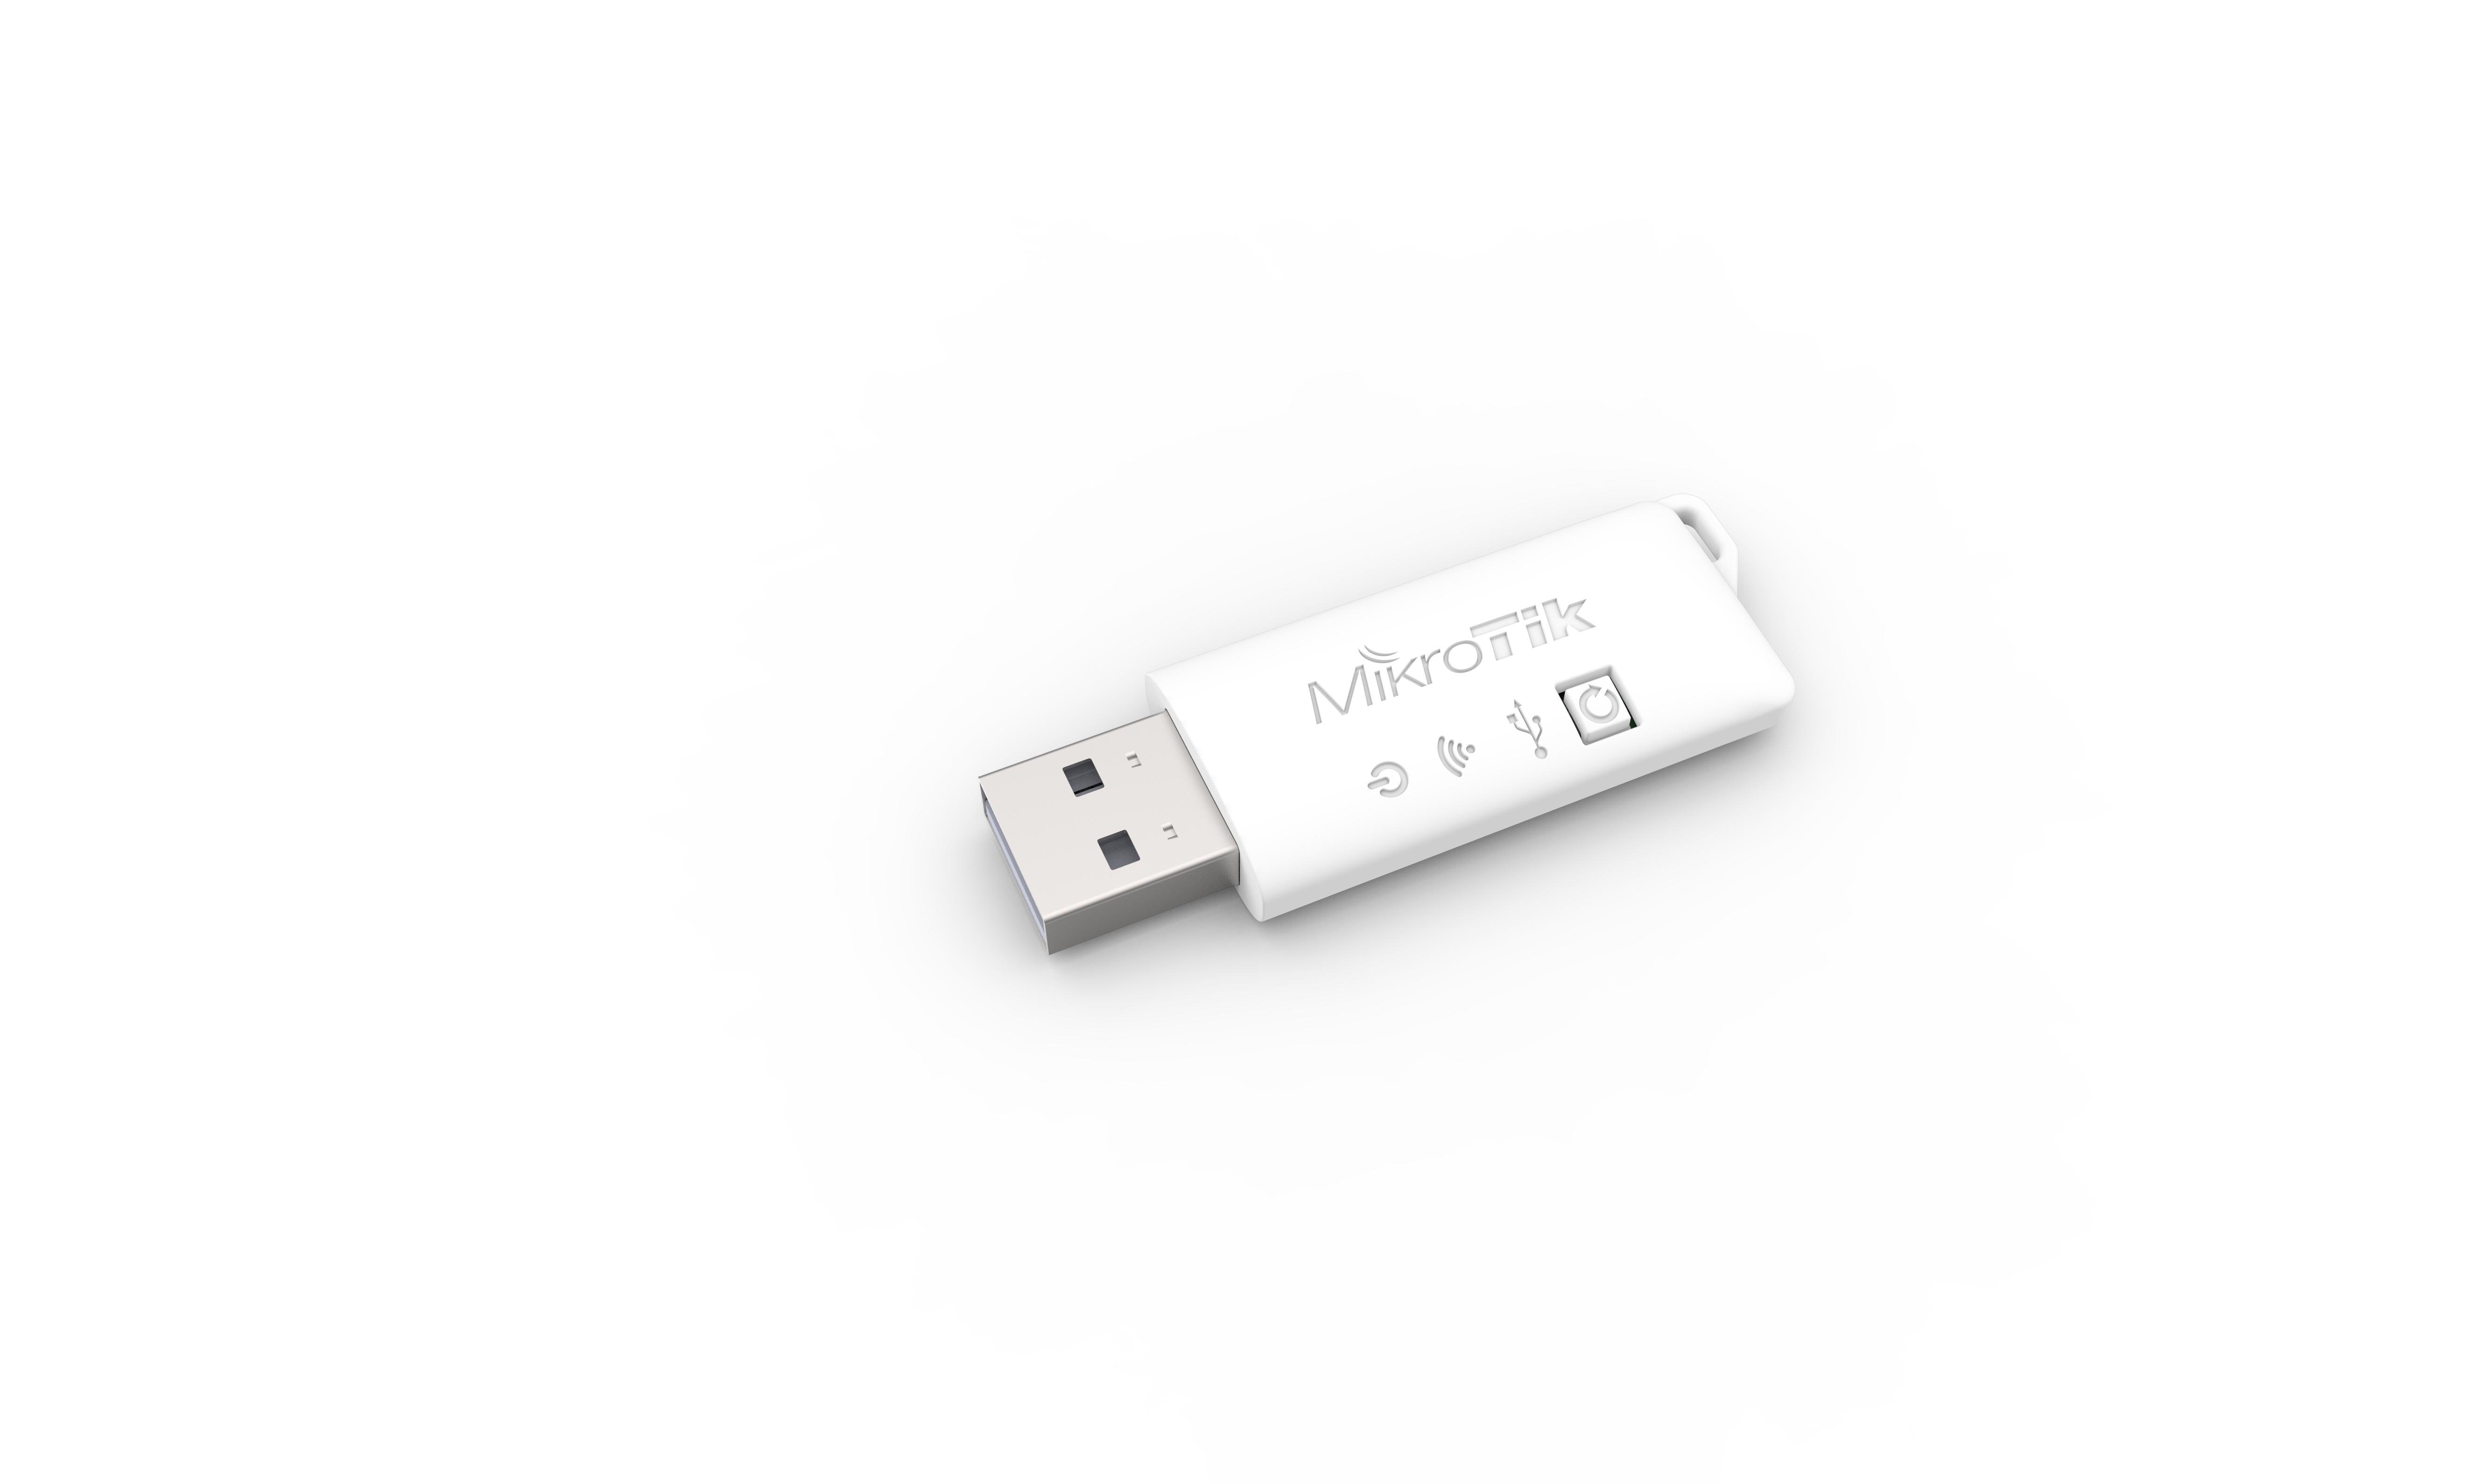 Woobm-USB